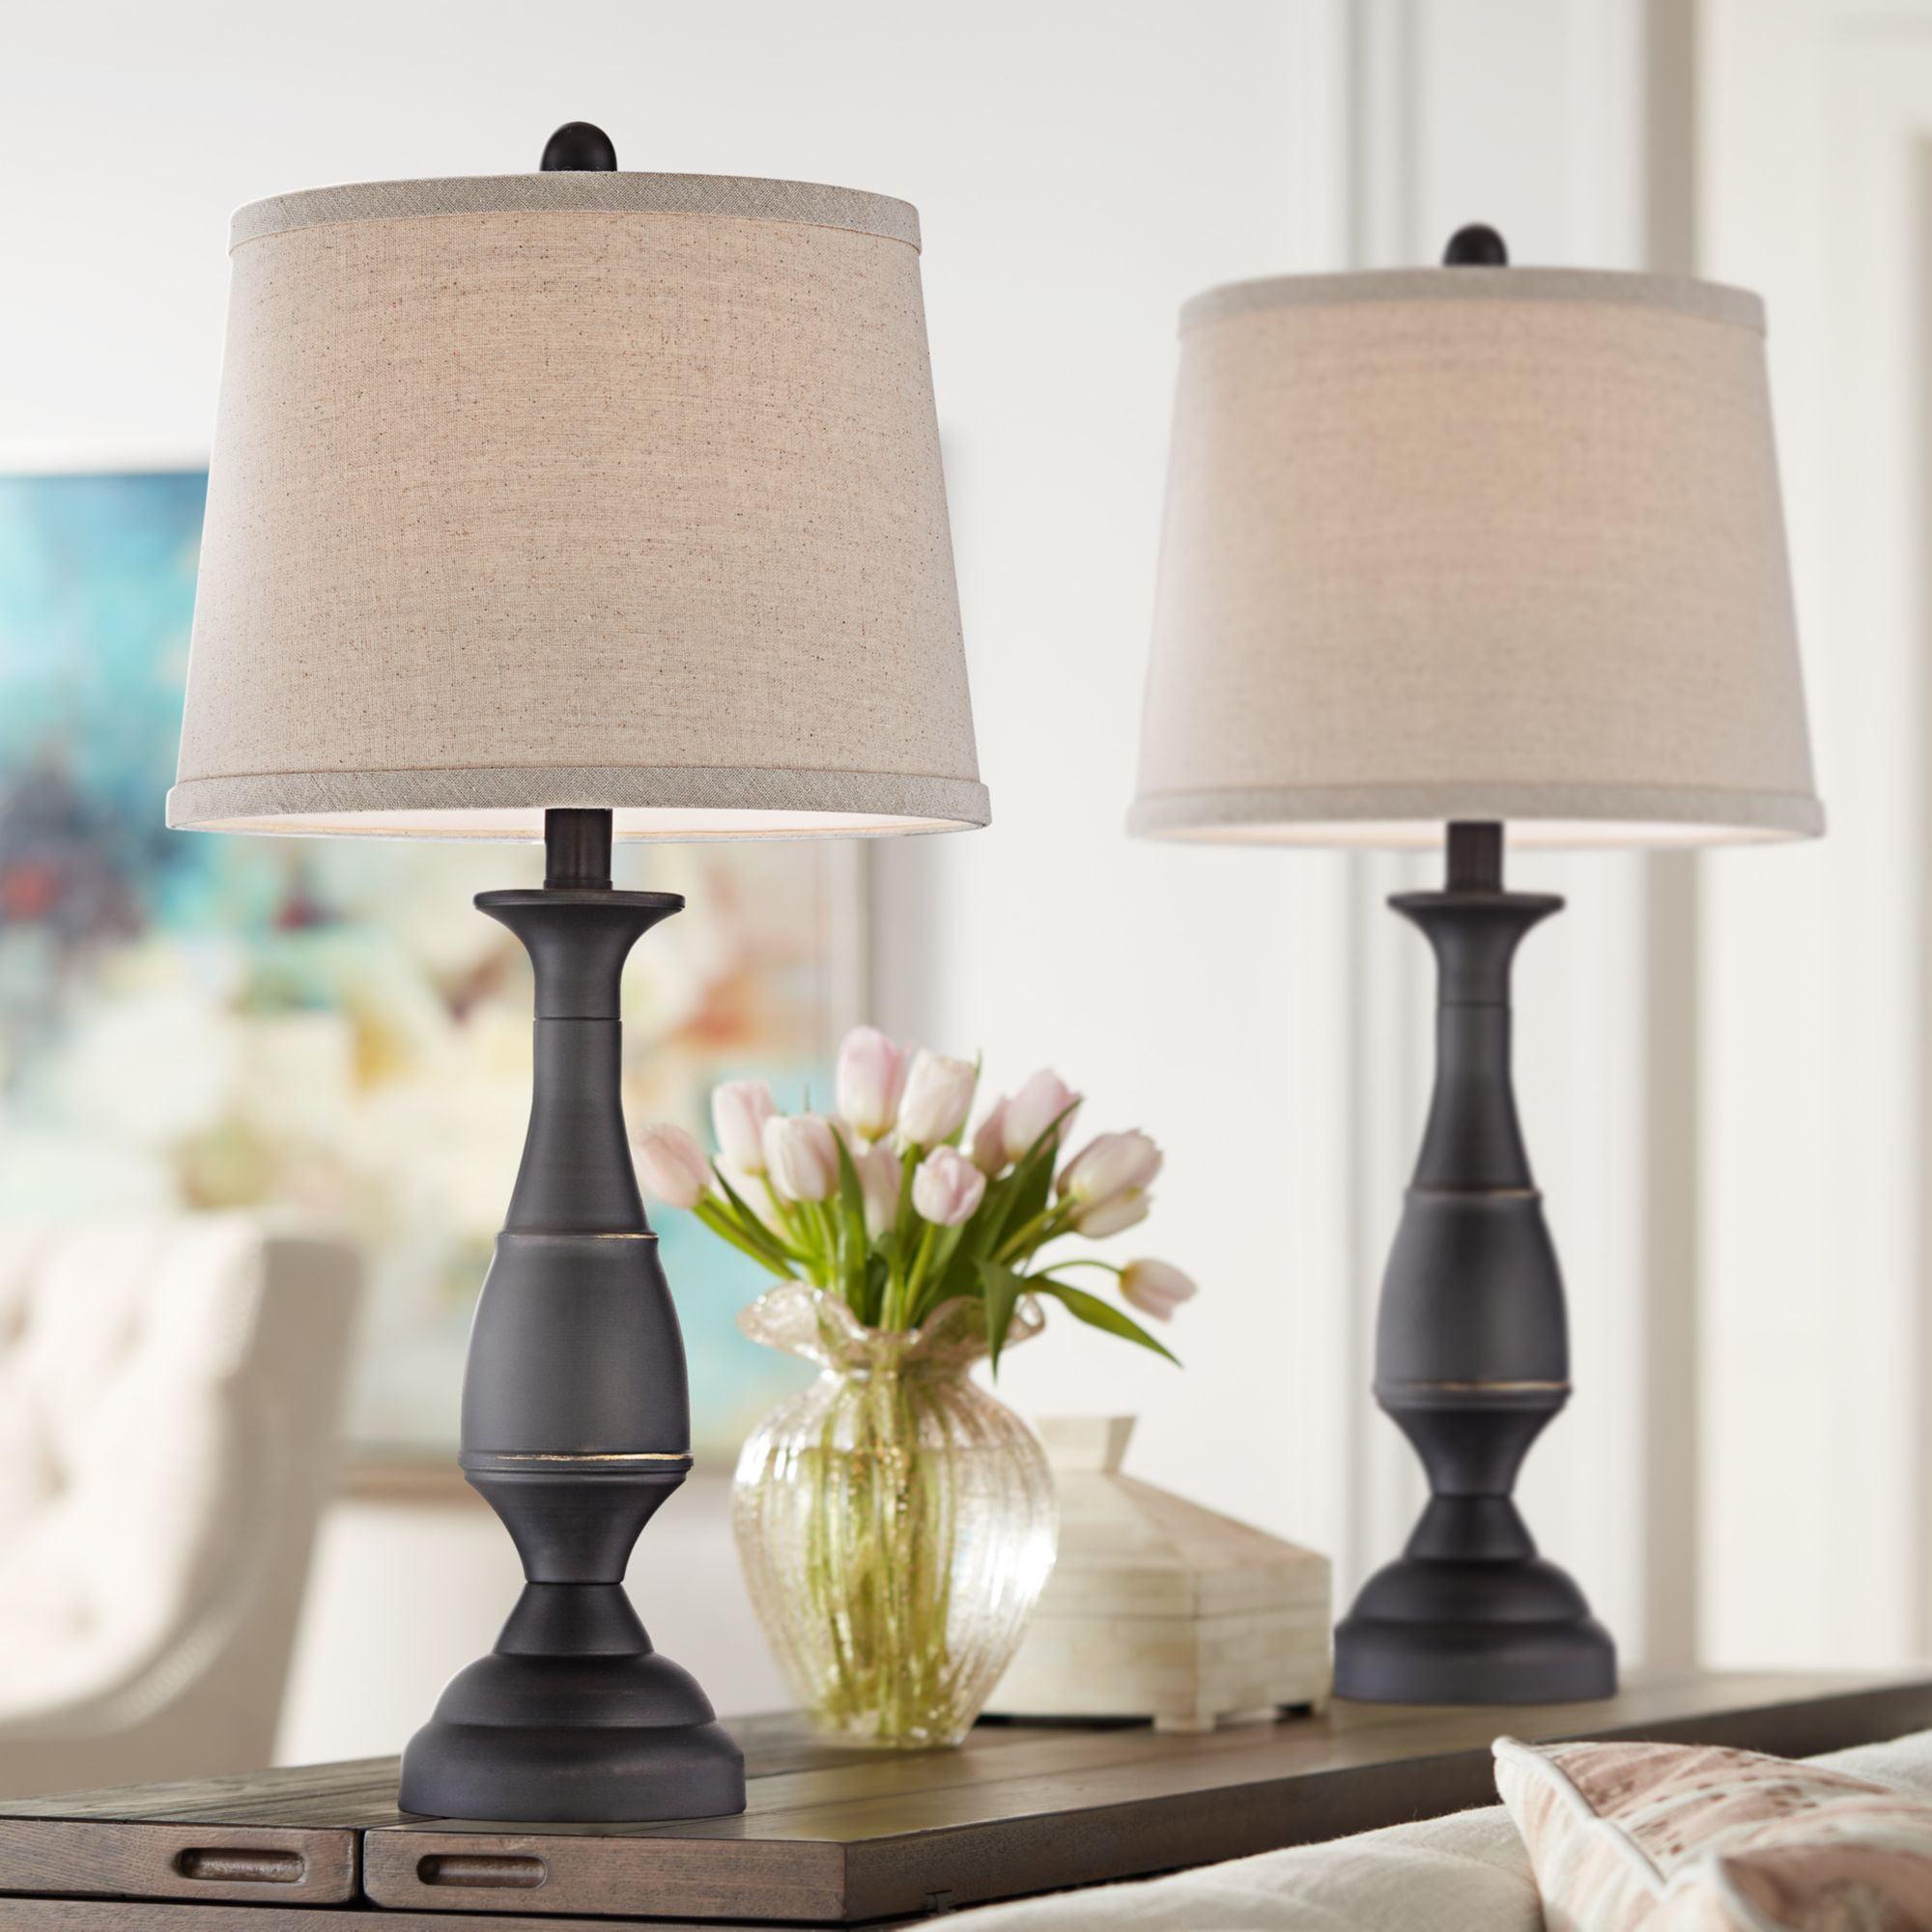 Regency Hill Traditional Table Lamps Set of 2 Dark Bronze Metal ...